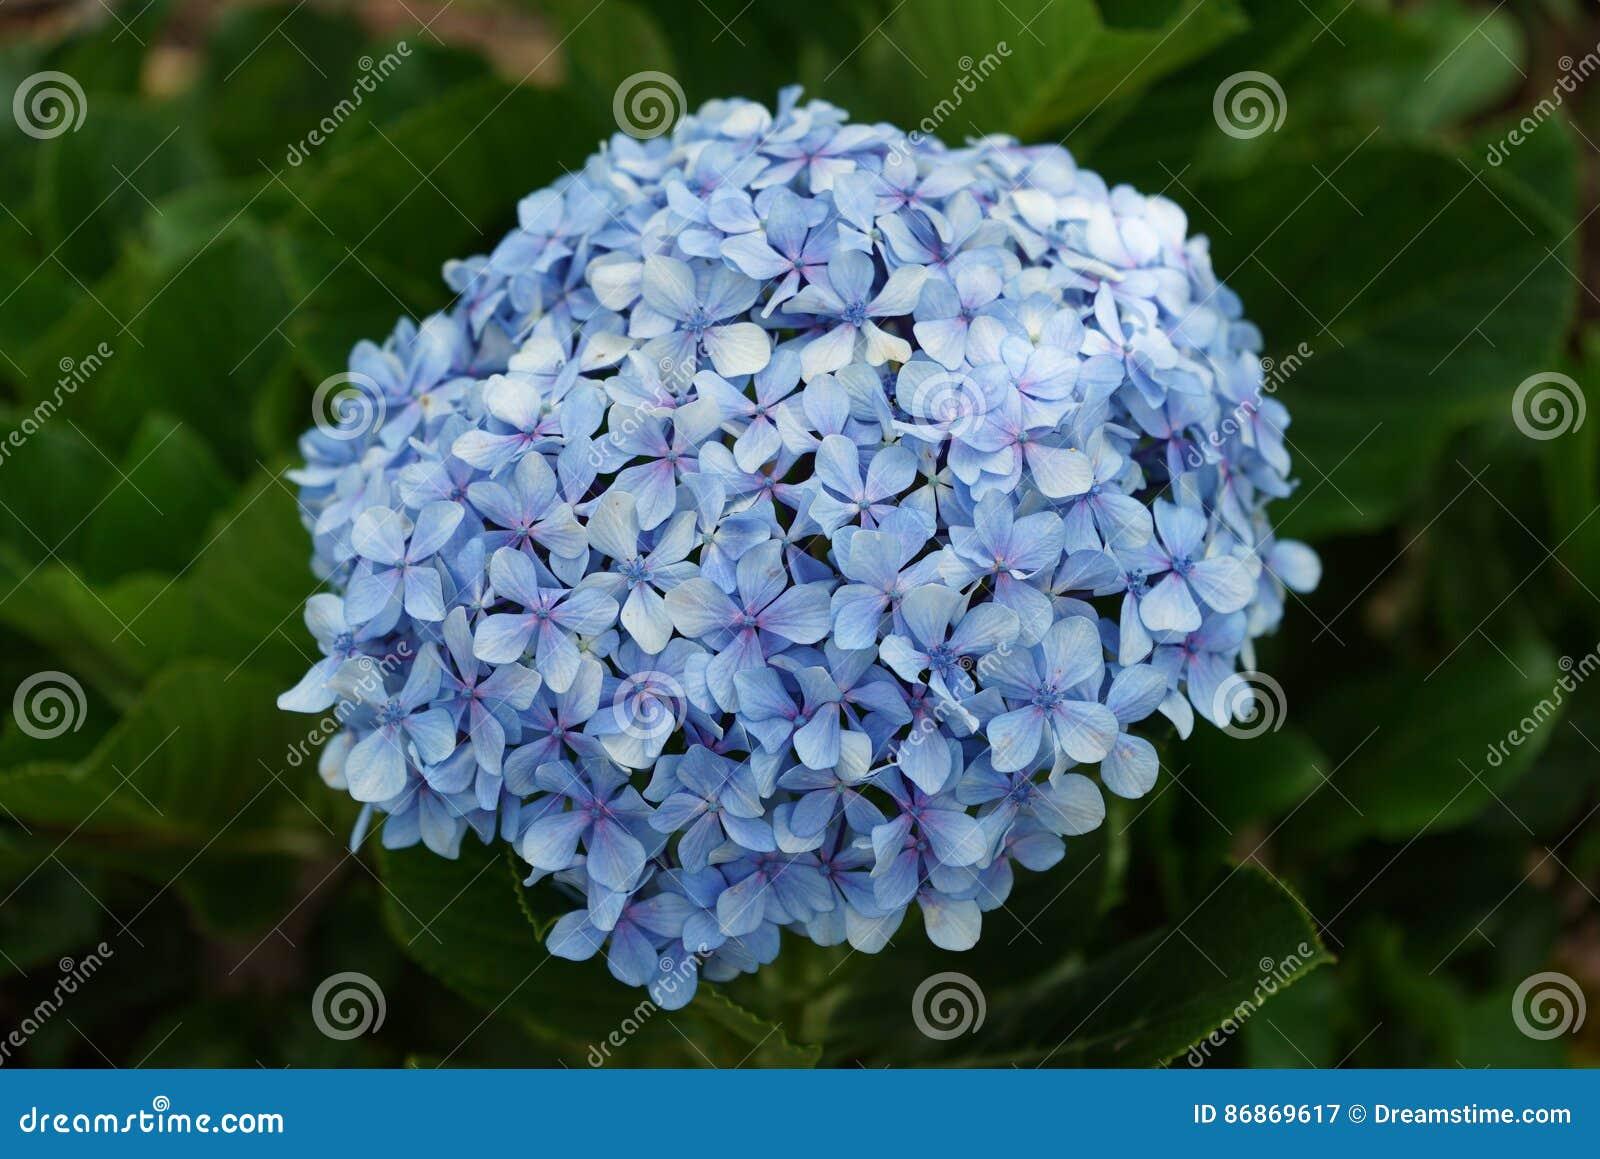 Hortensia bleu de fleur Fin vers le haut